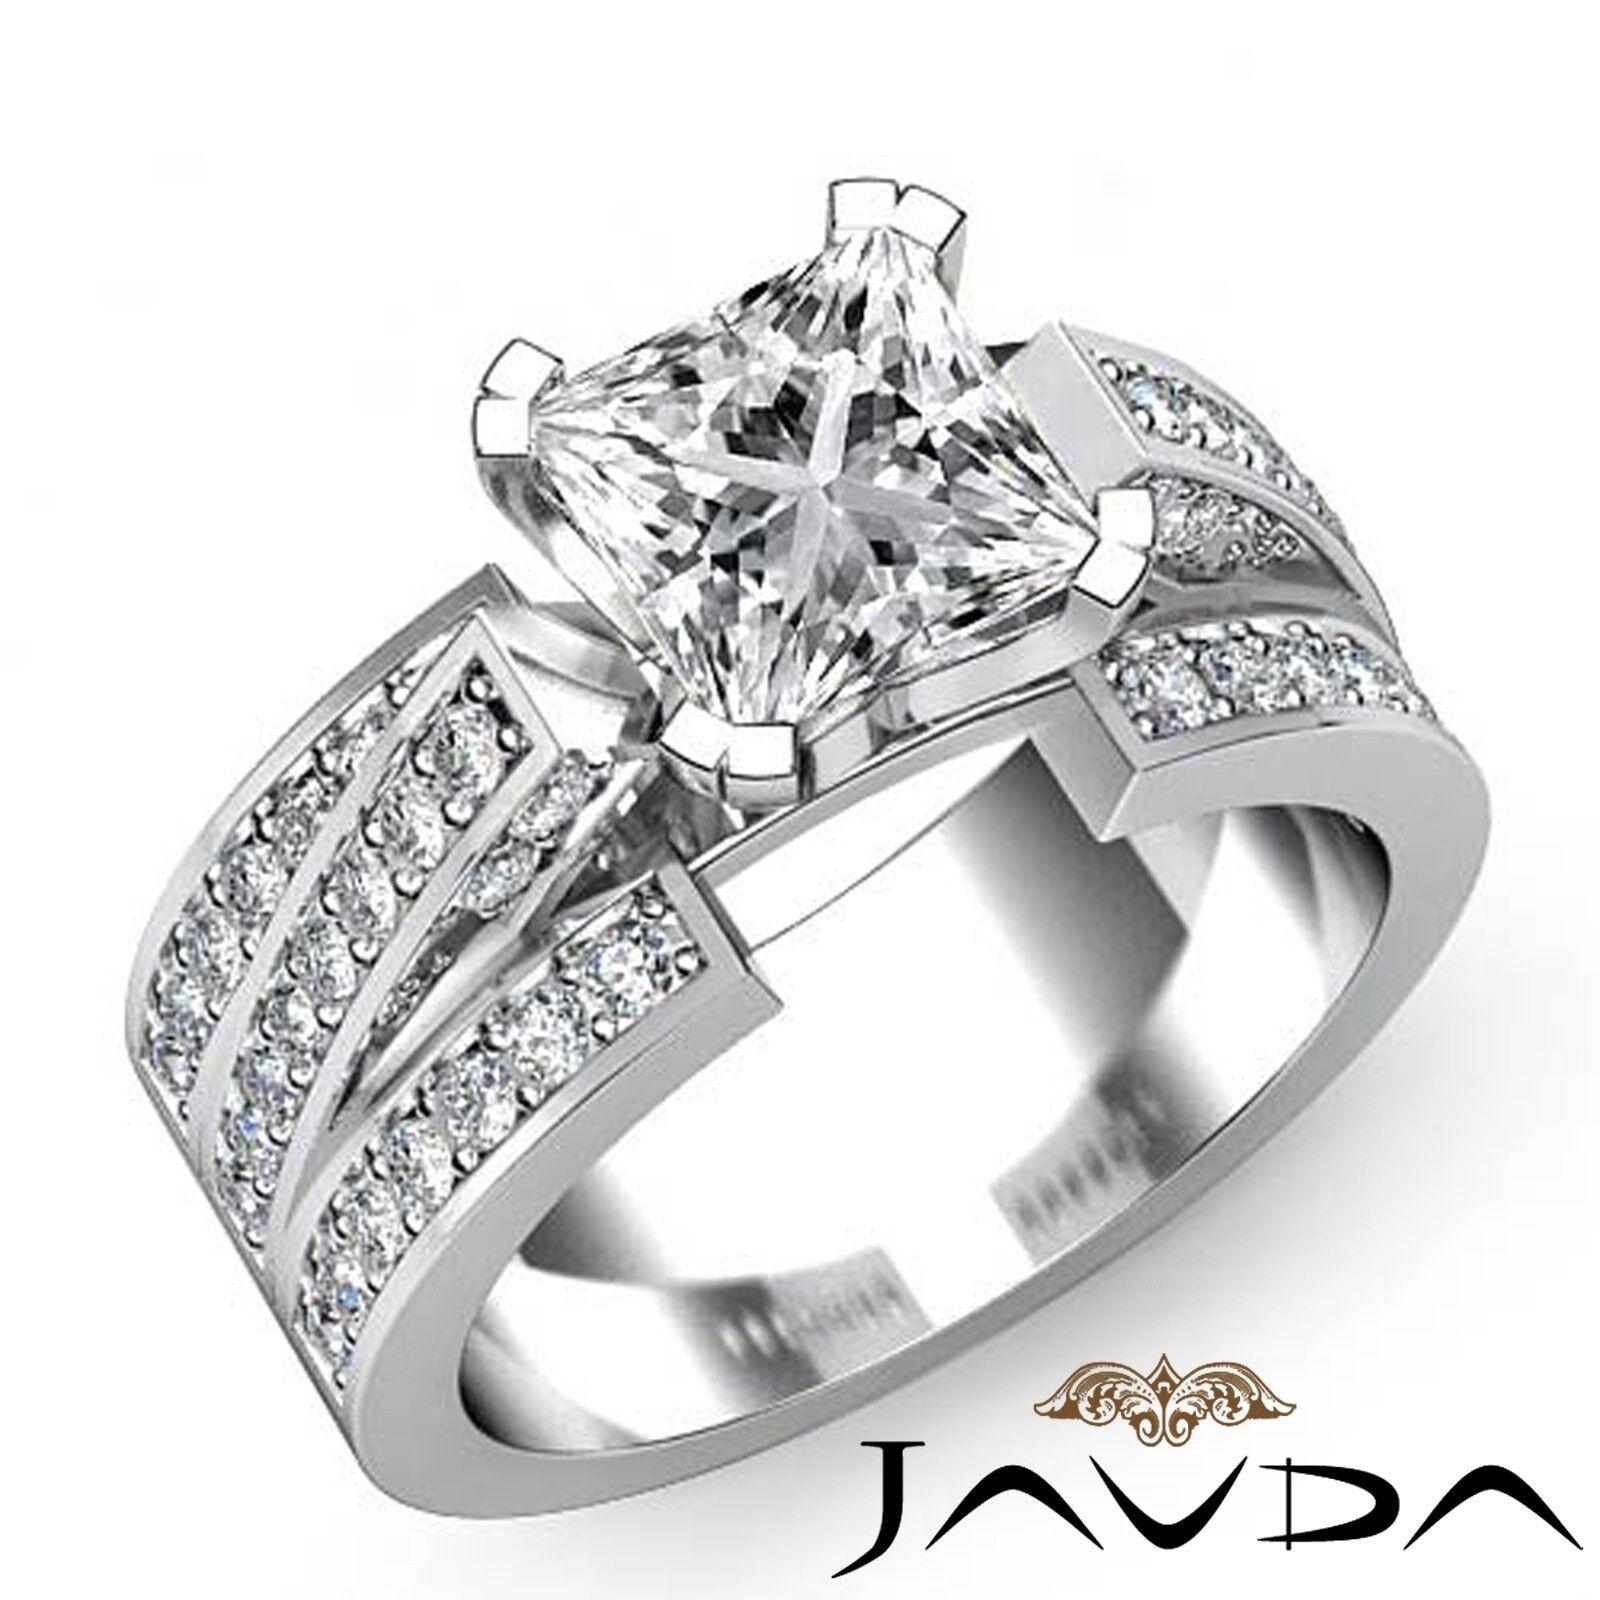 2.26ct Trio Shank Pave Set Princess Diamond Engagement Ring GIA K-VS1 White Gold